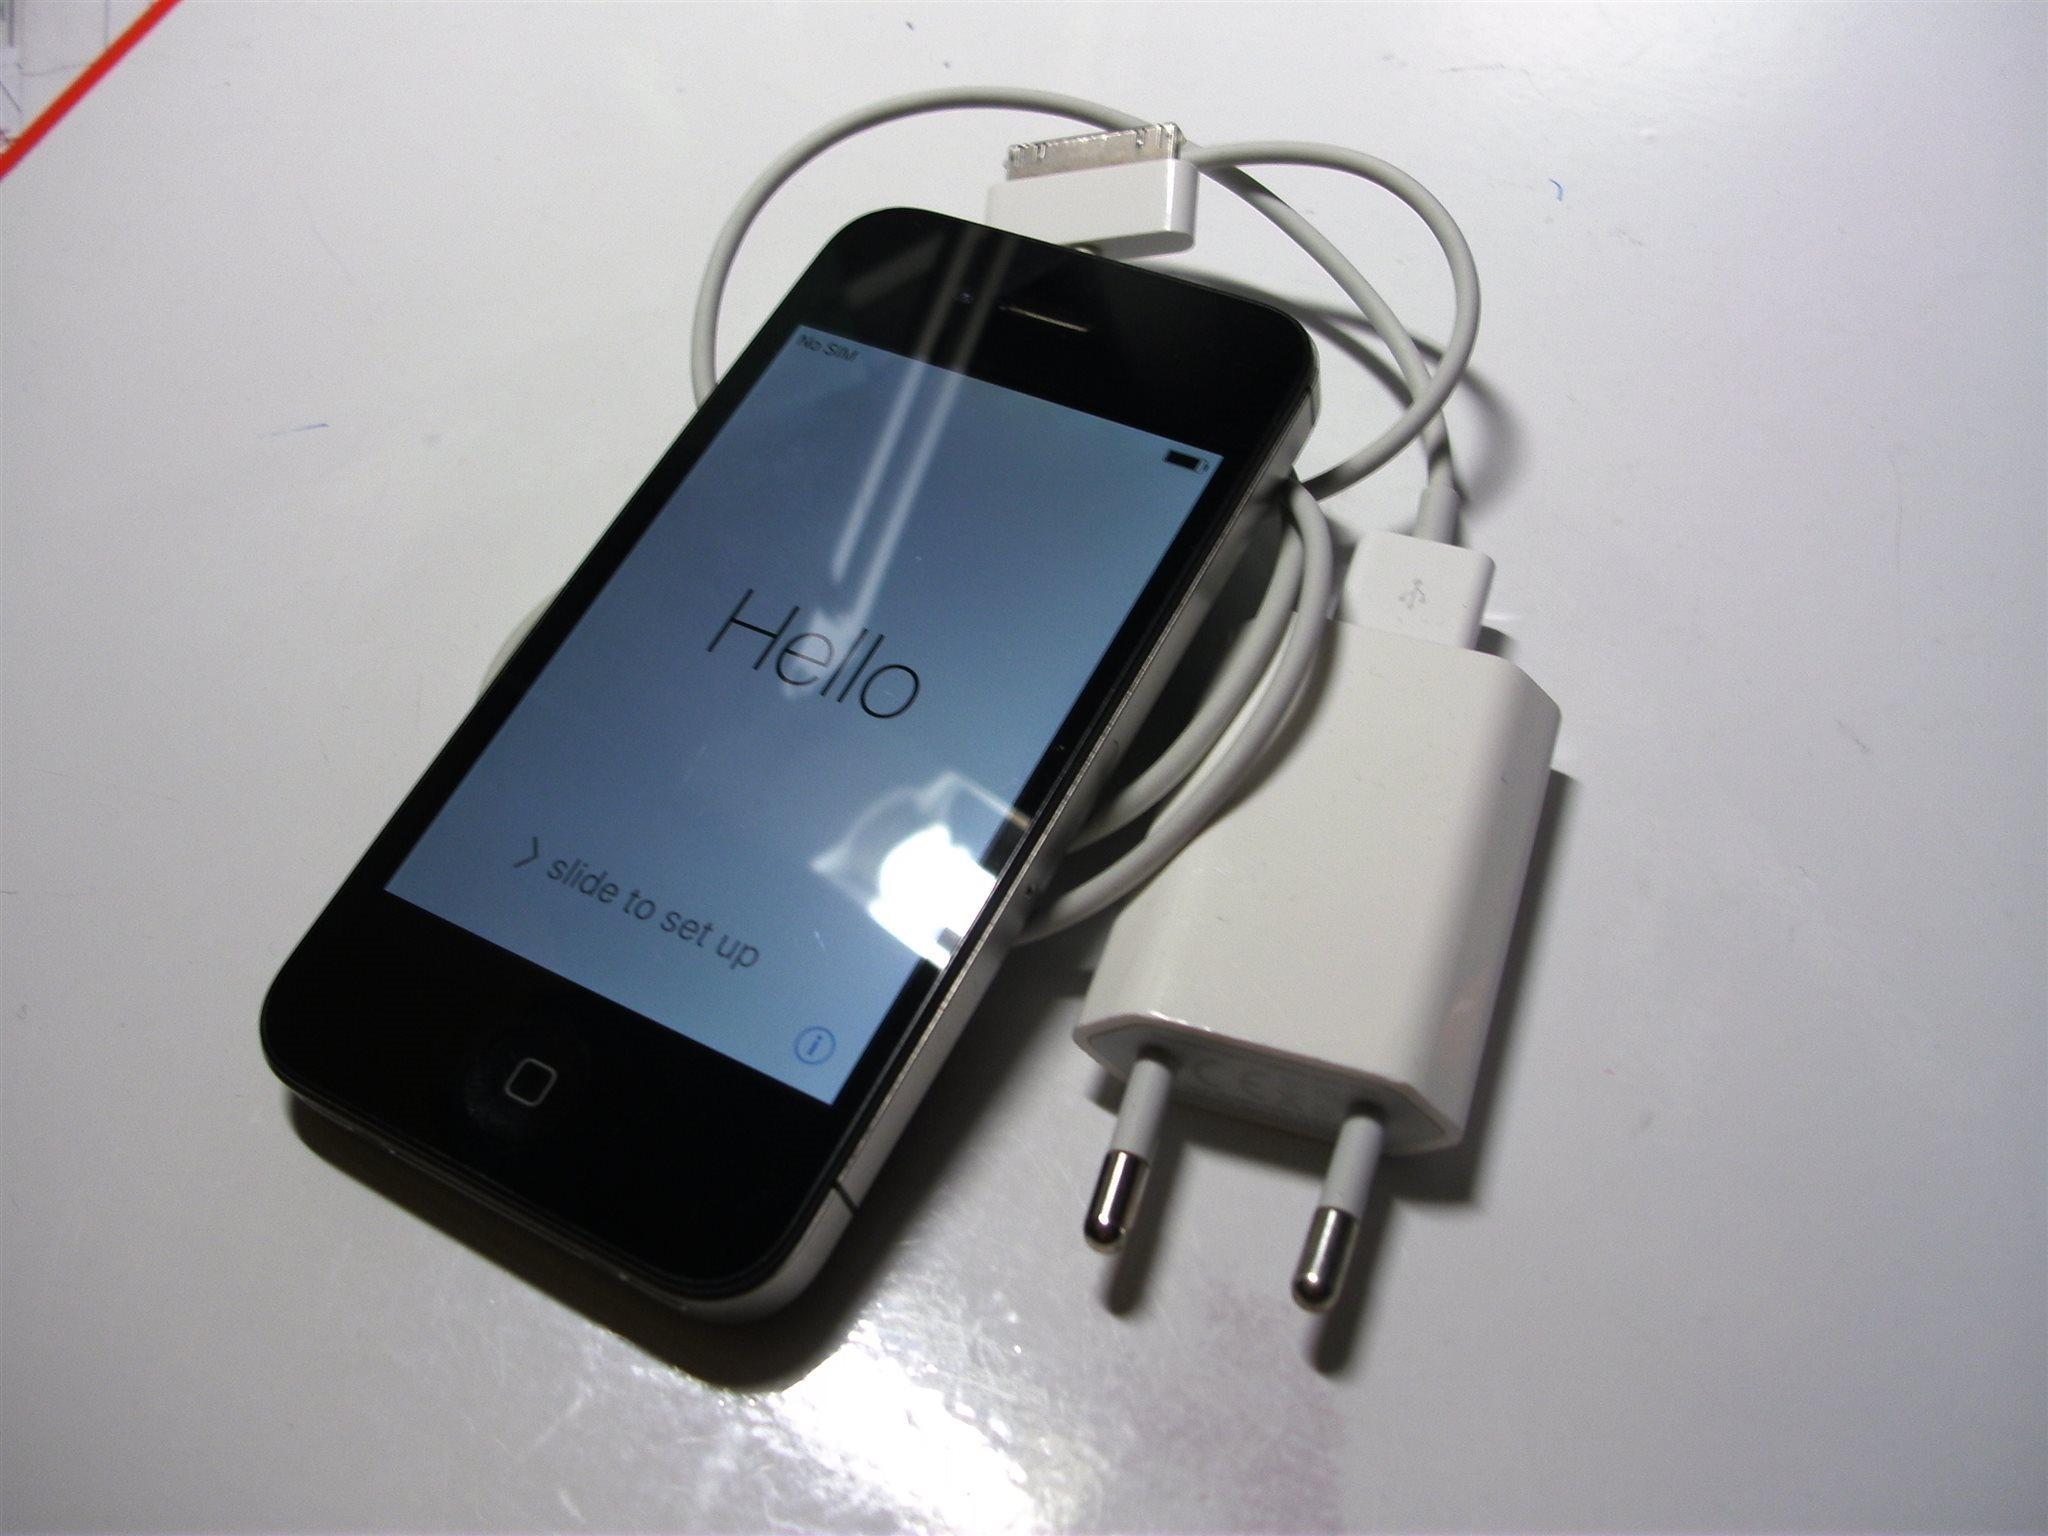 IPHONE 4S --DEFEKT PÅ MIKROFON-- (330258145) ᐈ Köp på Tradera 03e68c1265637